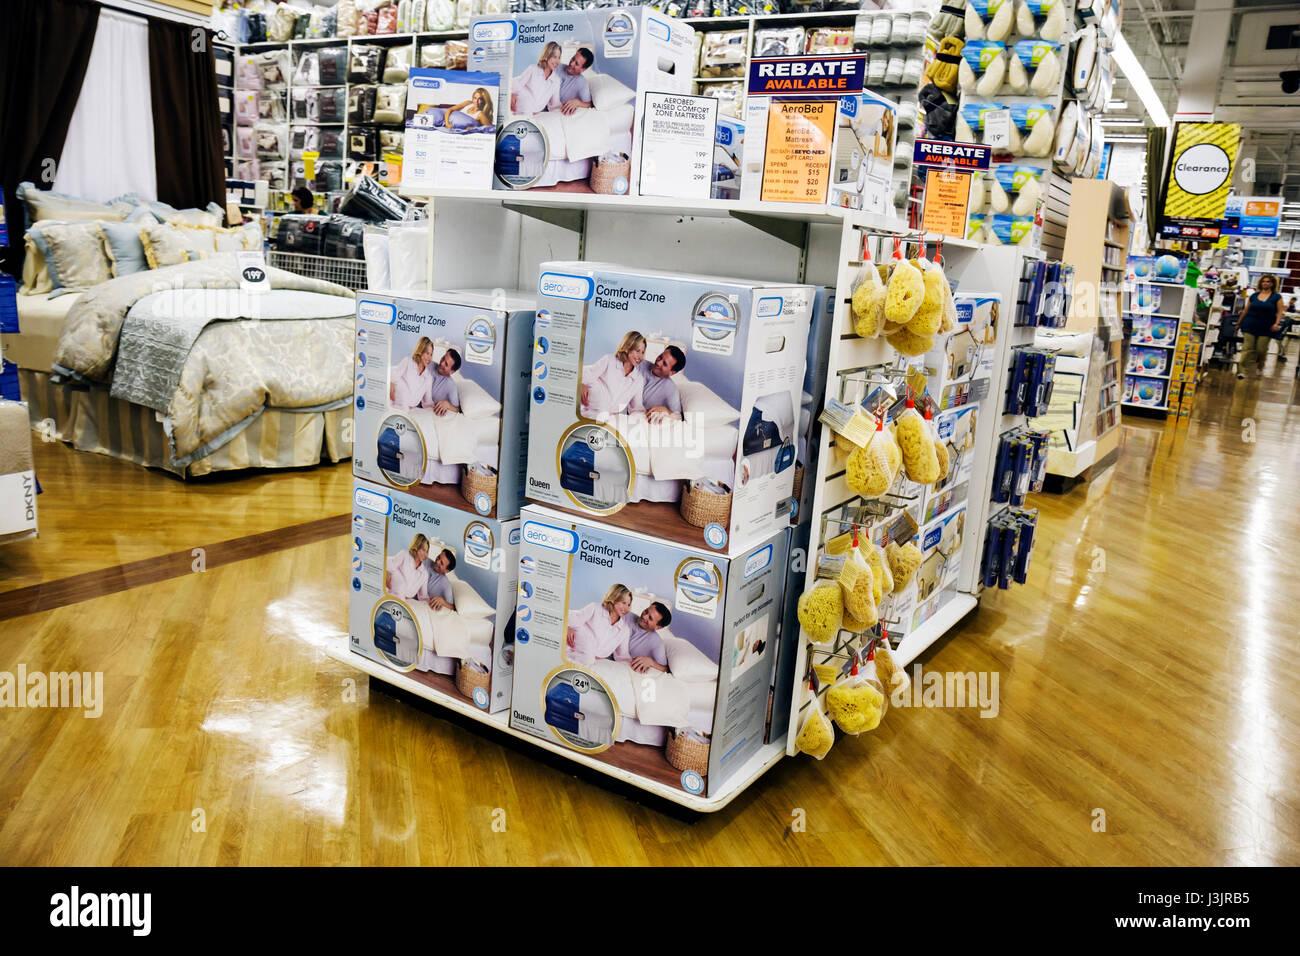 Miami Florida Dadeland Bed Bath And Beyond House Wares